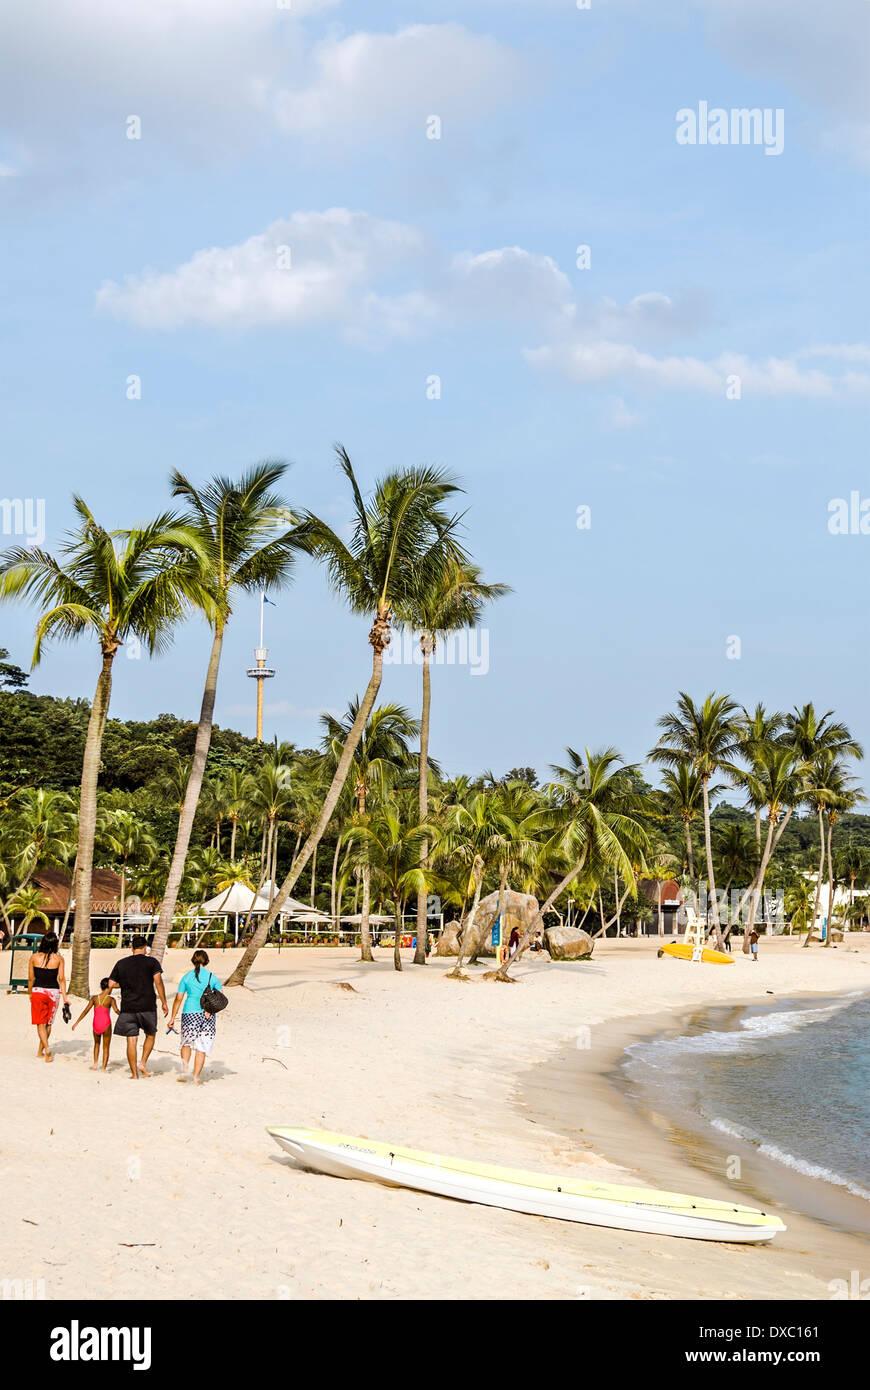 Picturesque Siloso Beach on Sentosa Island, Singapore - Stock Image